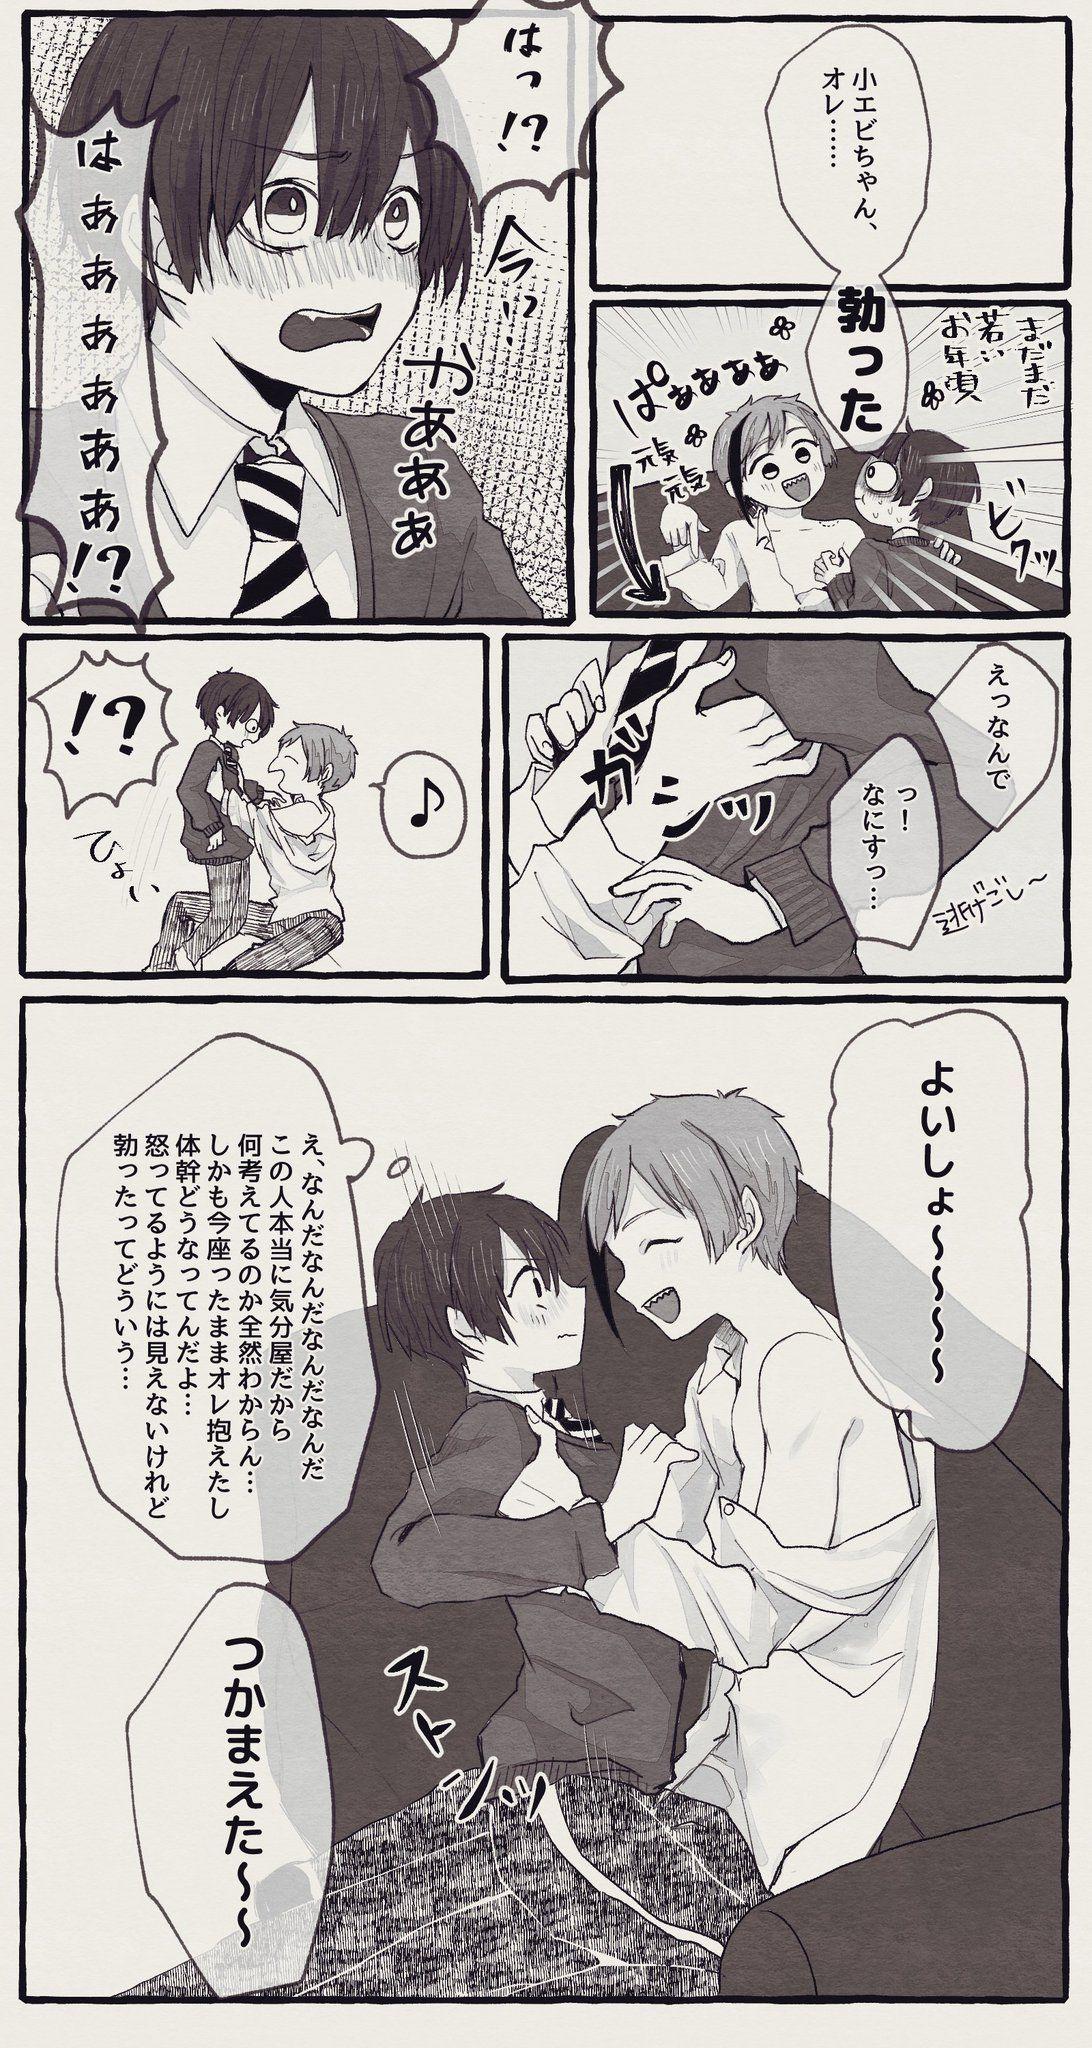 mgw on twitter disney princess villains anime disney art